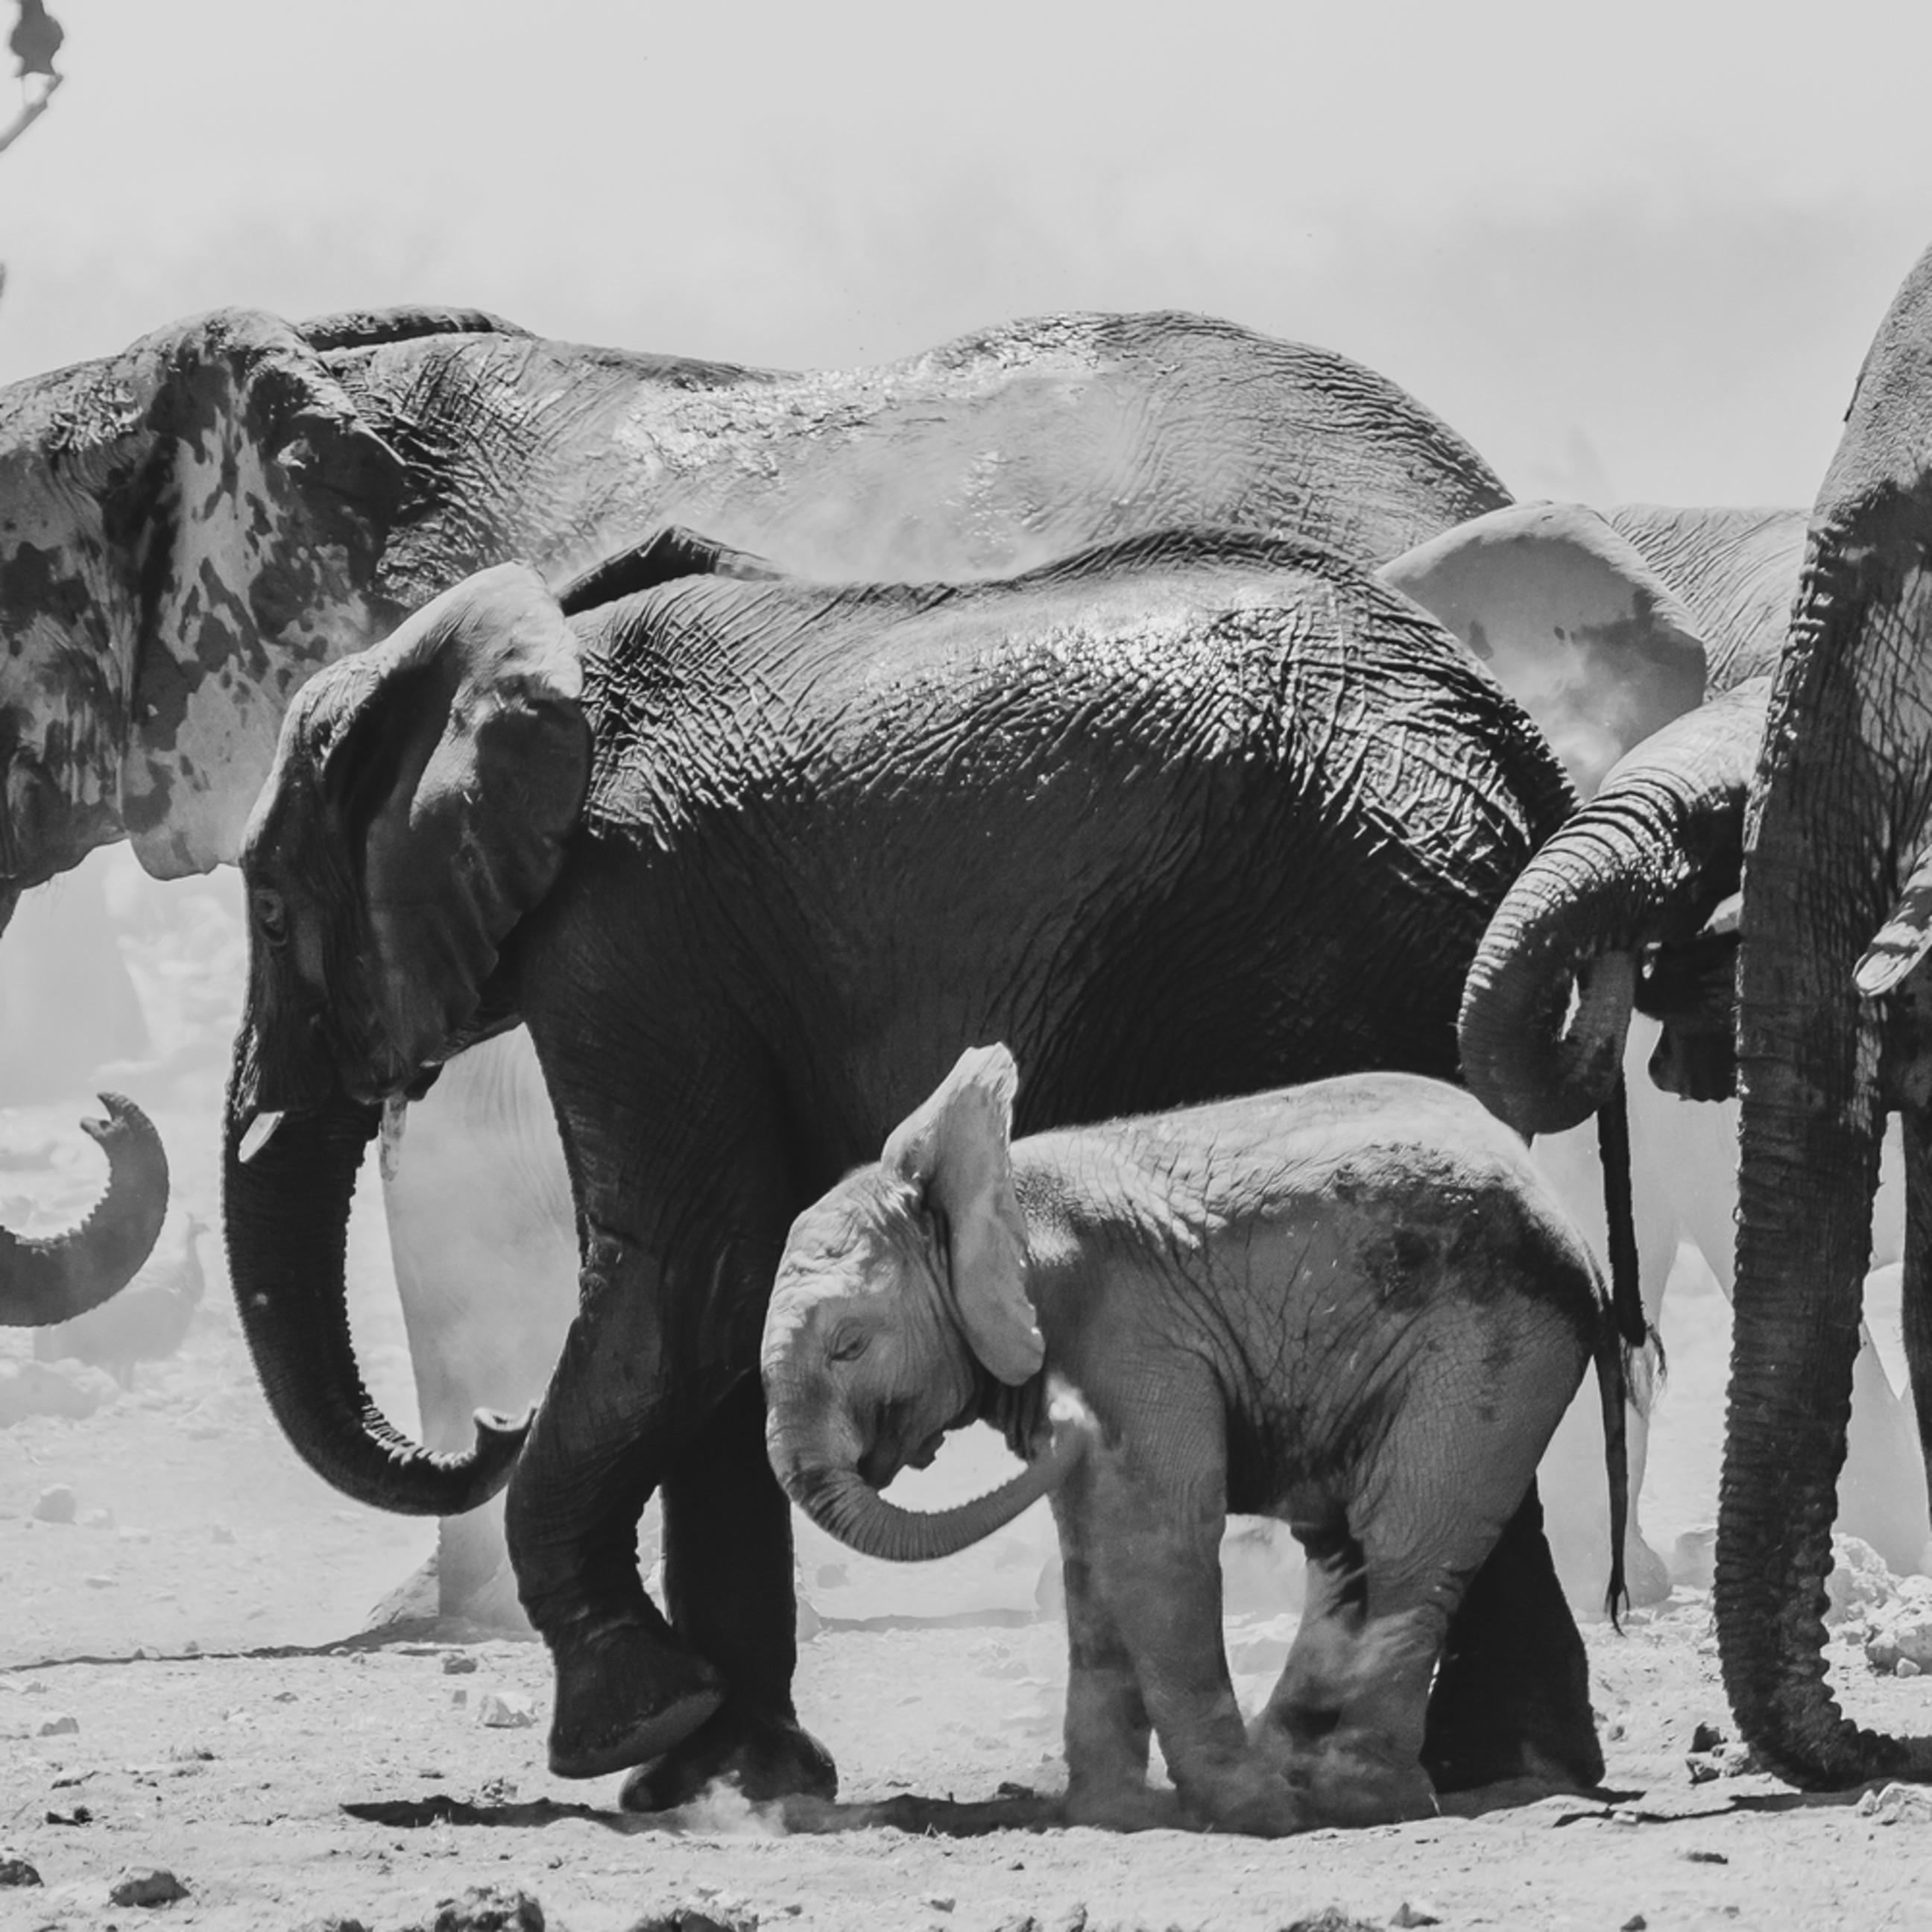 Elephantact rjfiz9